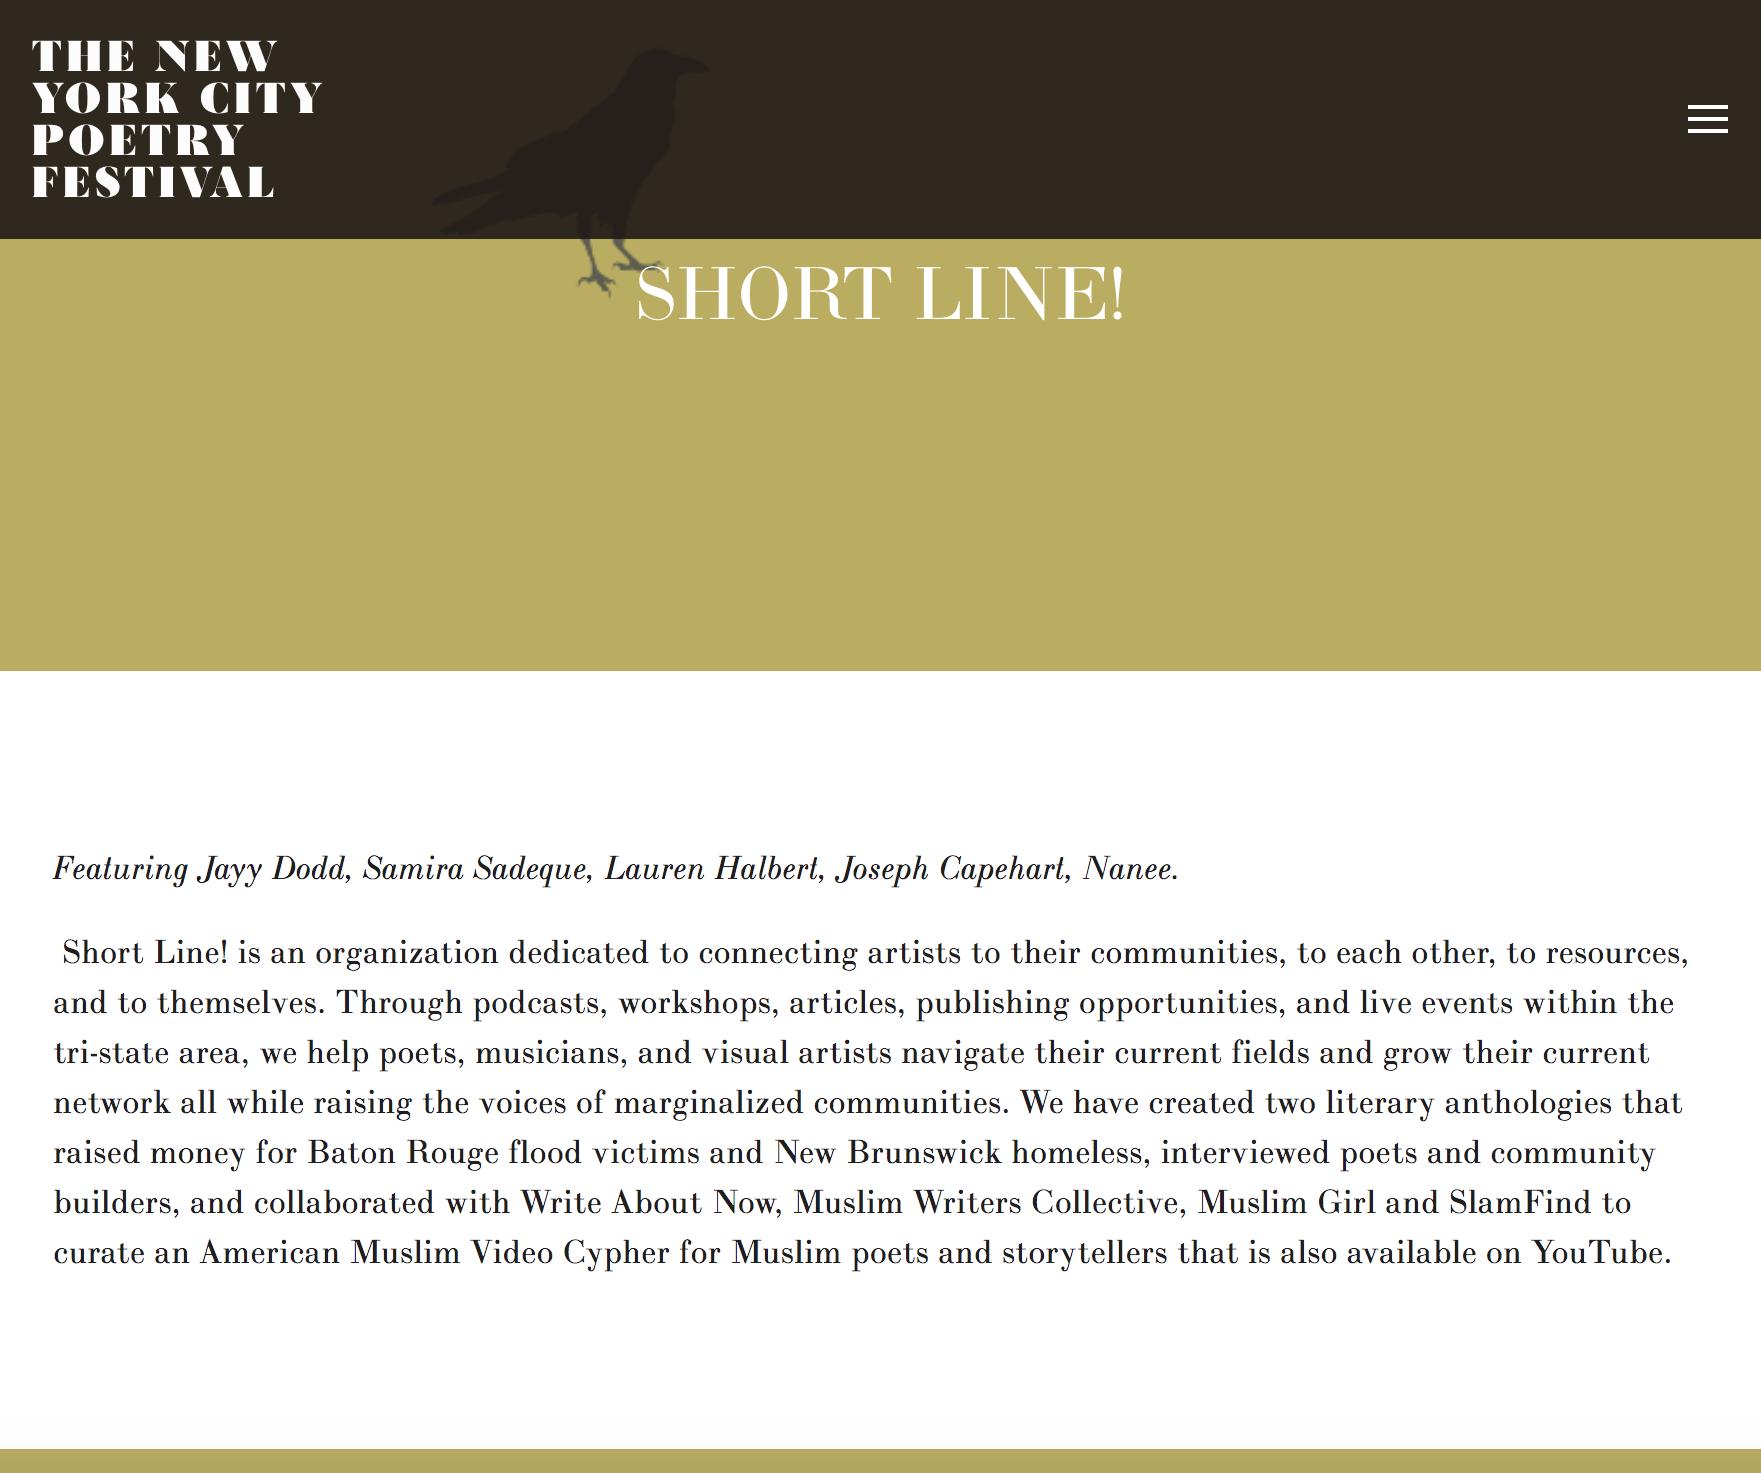 shortline_NYC Poetry Festival Samira Sadeque.png